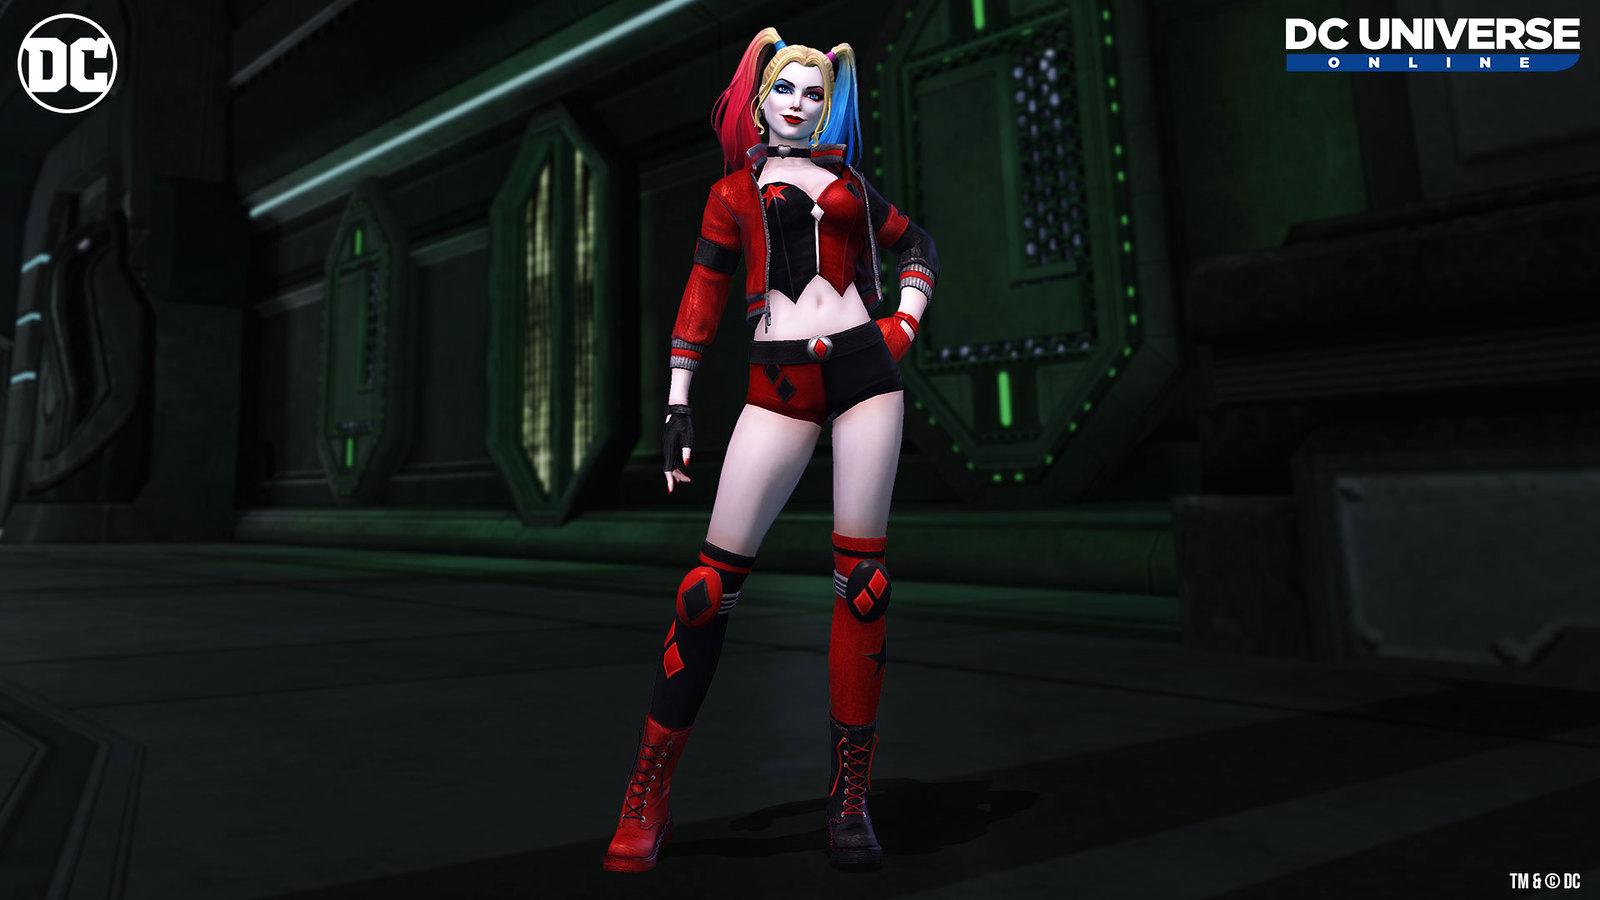 DC Universe Online: Birds of Prey - Harley Quinn